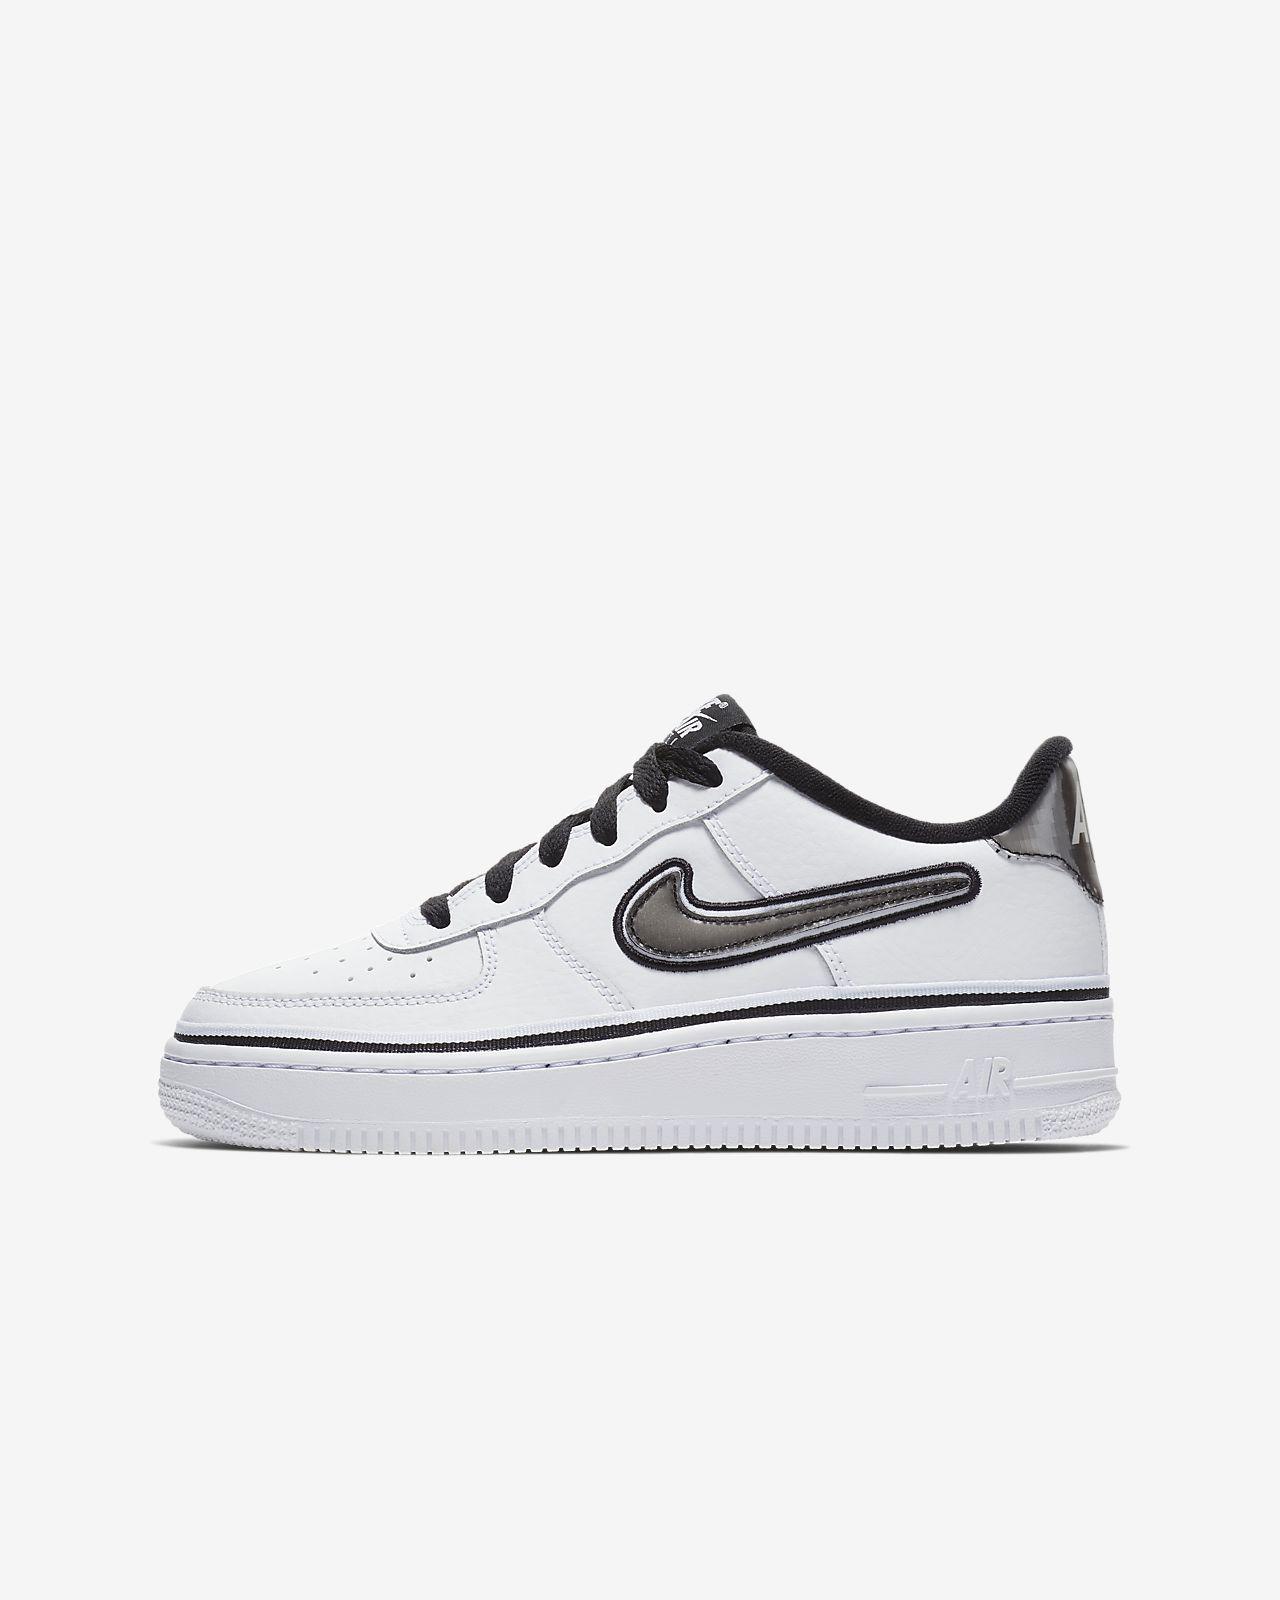 Nike Air Force 1 LV8 Sport (GS)大童运动童鞋